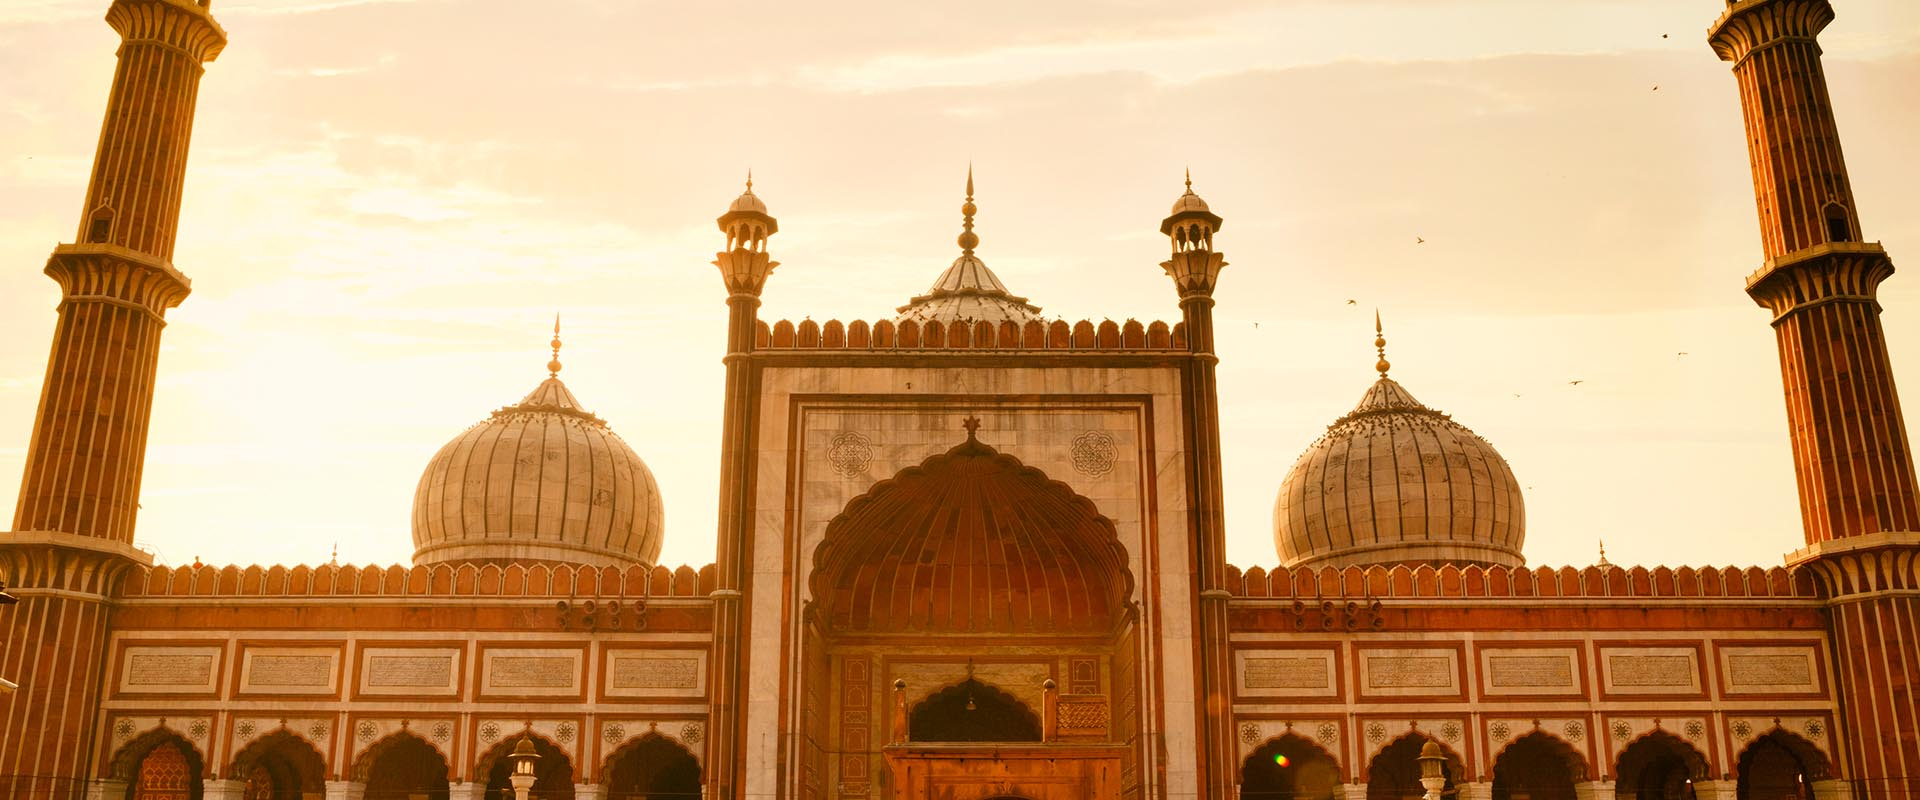 Great 2018 Kuwait Eid Al-Fitr Greeting - India_idulZuha_1920_800  Trends_932820 .jpg